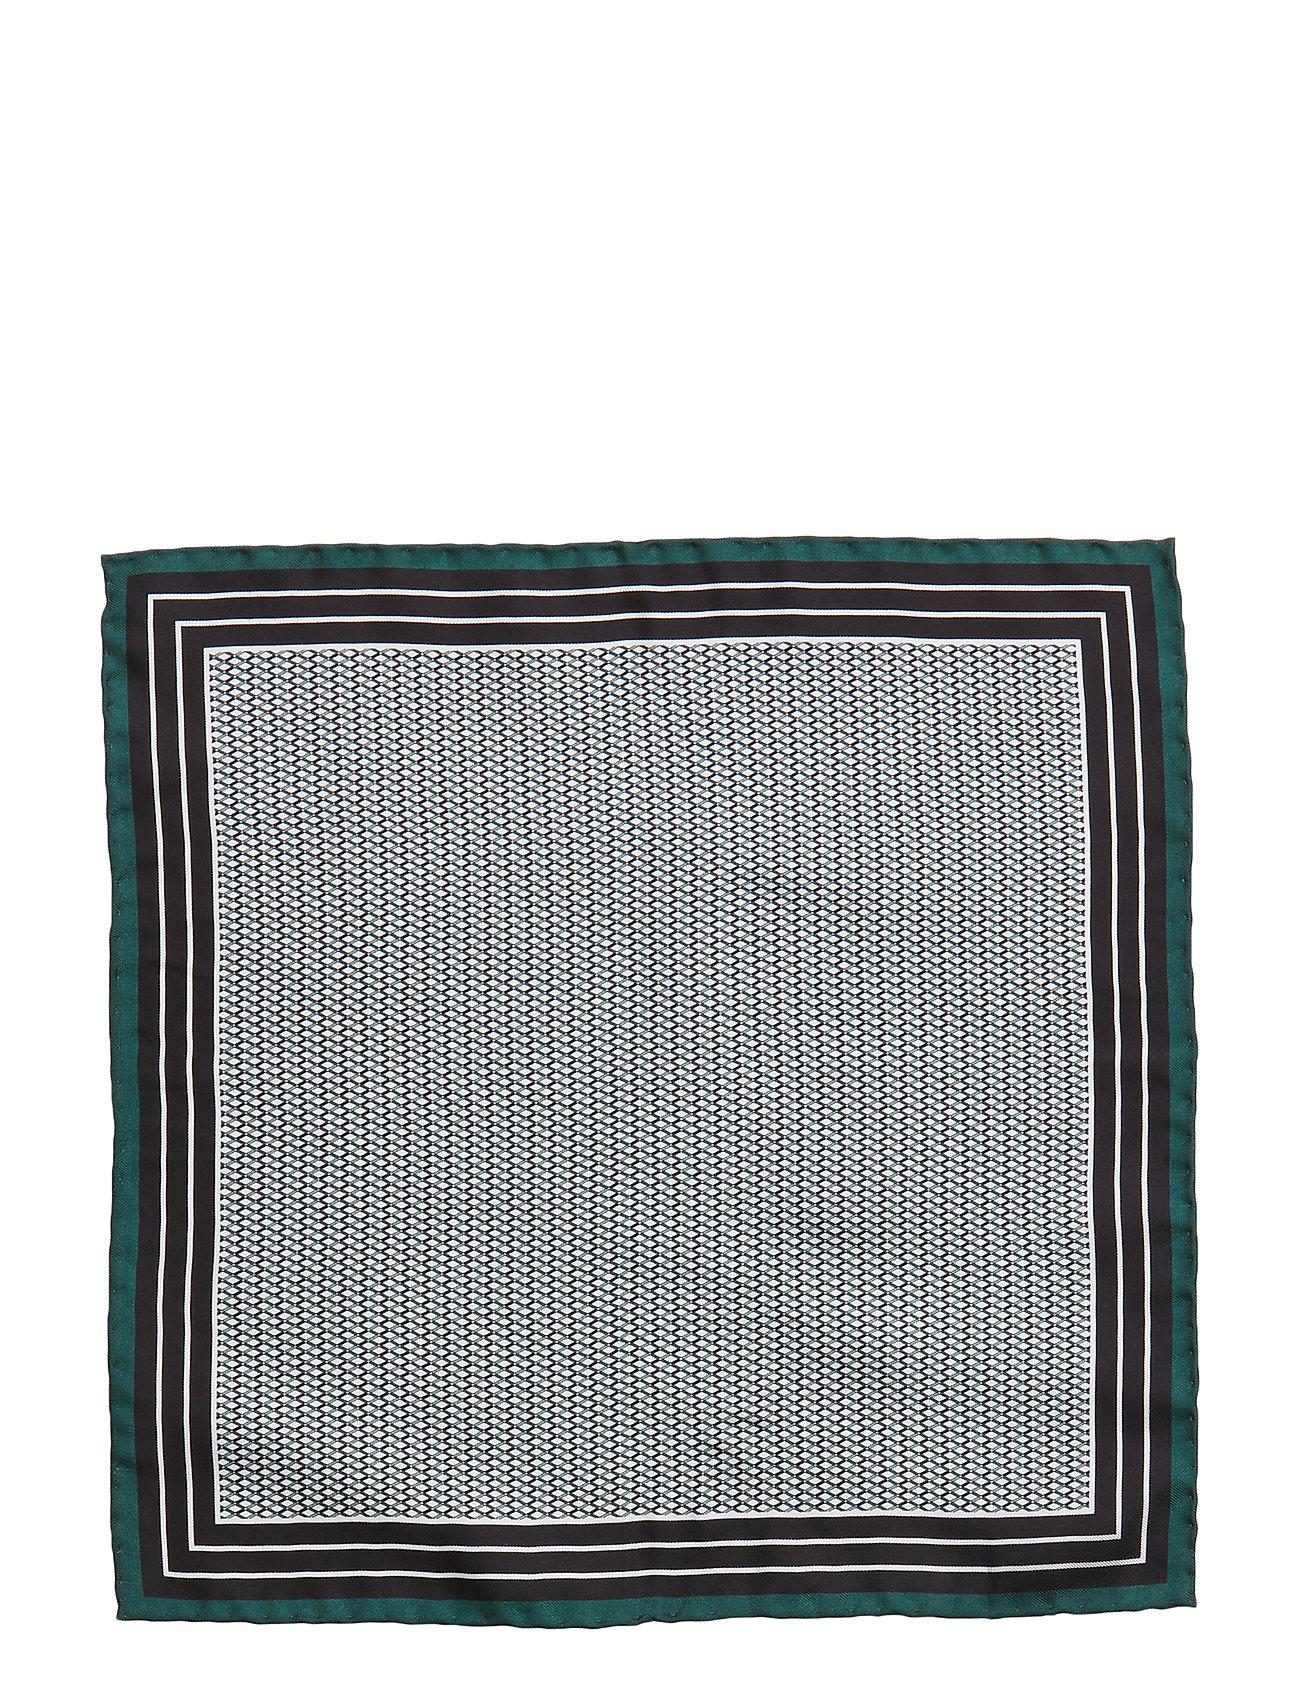 T-Pocket Sq. Cm33x33 Brystlommetørklæde Grøn BOSS BUSINESS WEAR